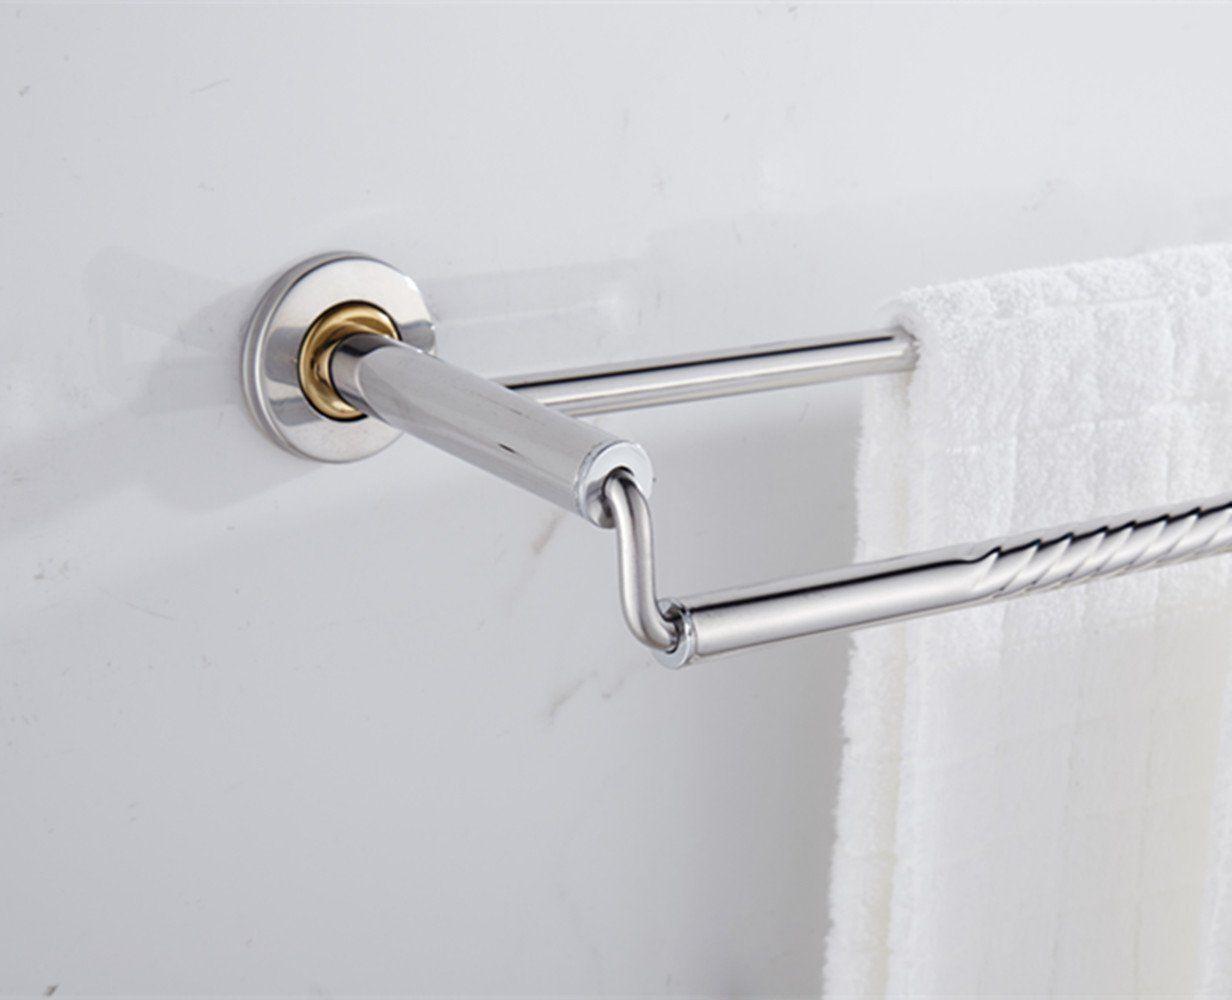 50cm Towel Rail Rack Holder Wall Mounted Bathroom Shelf Stainless steel UK